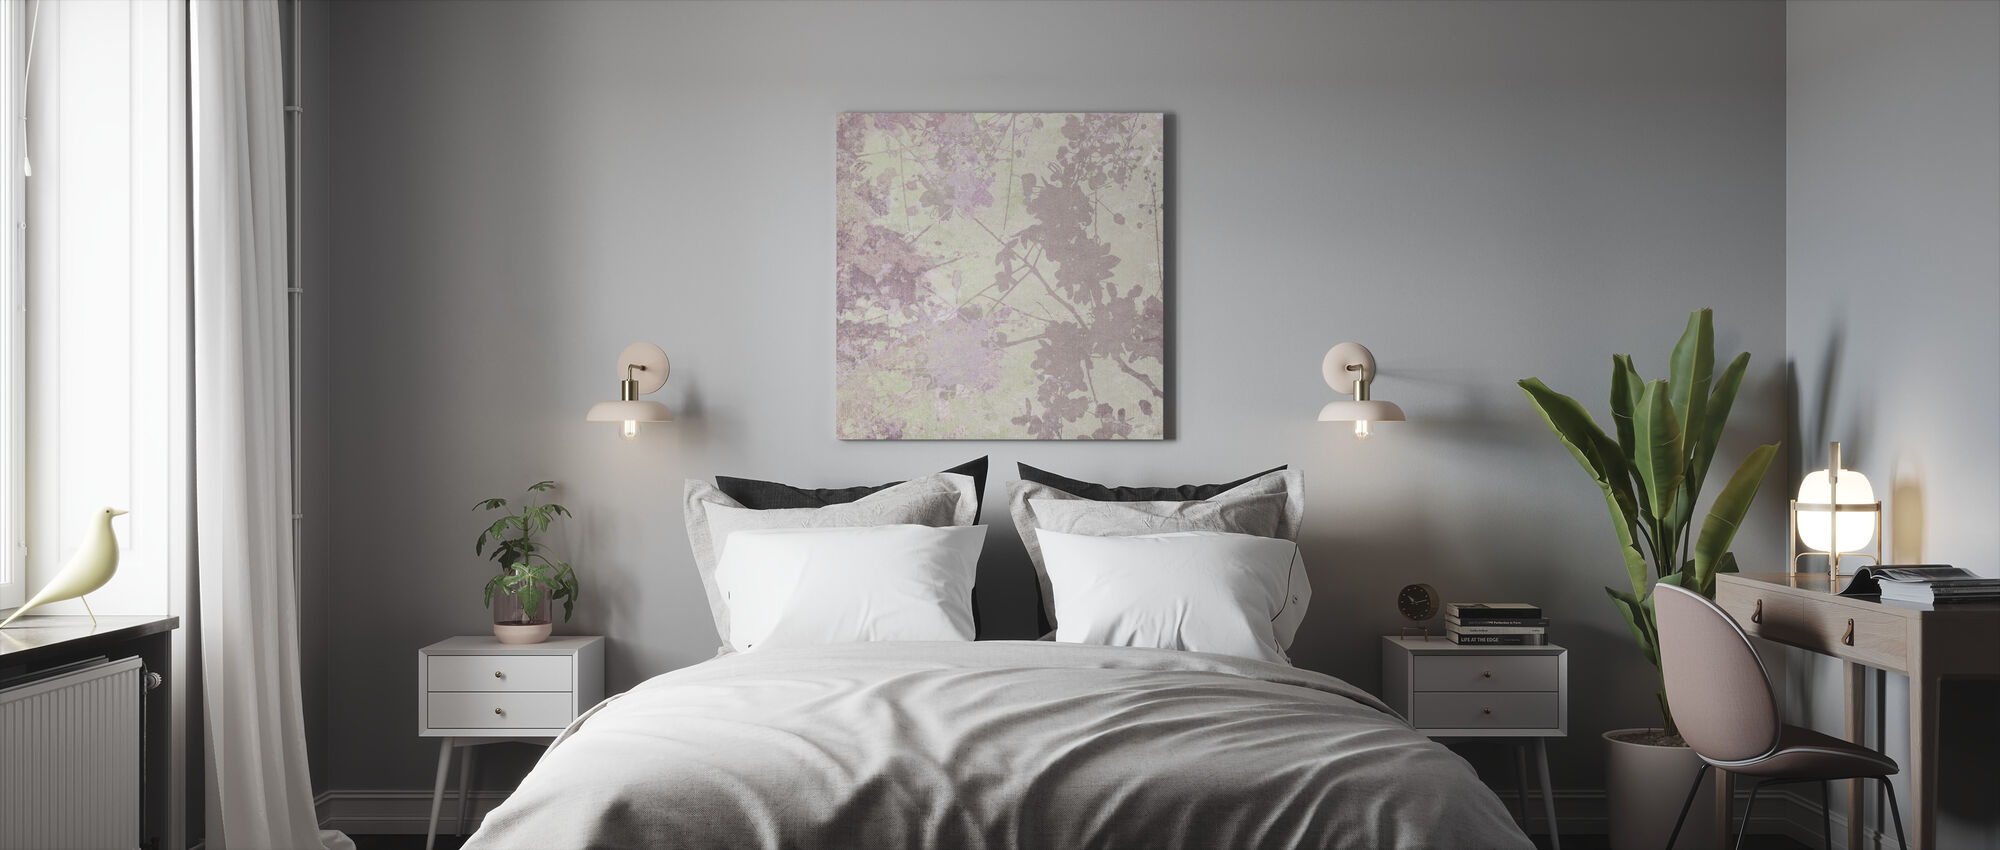 Good Night Sweetheart - Canvas print - Bedroom